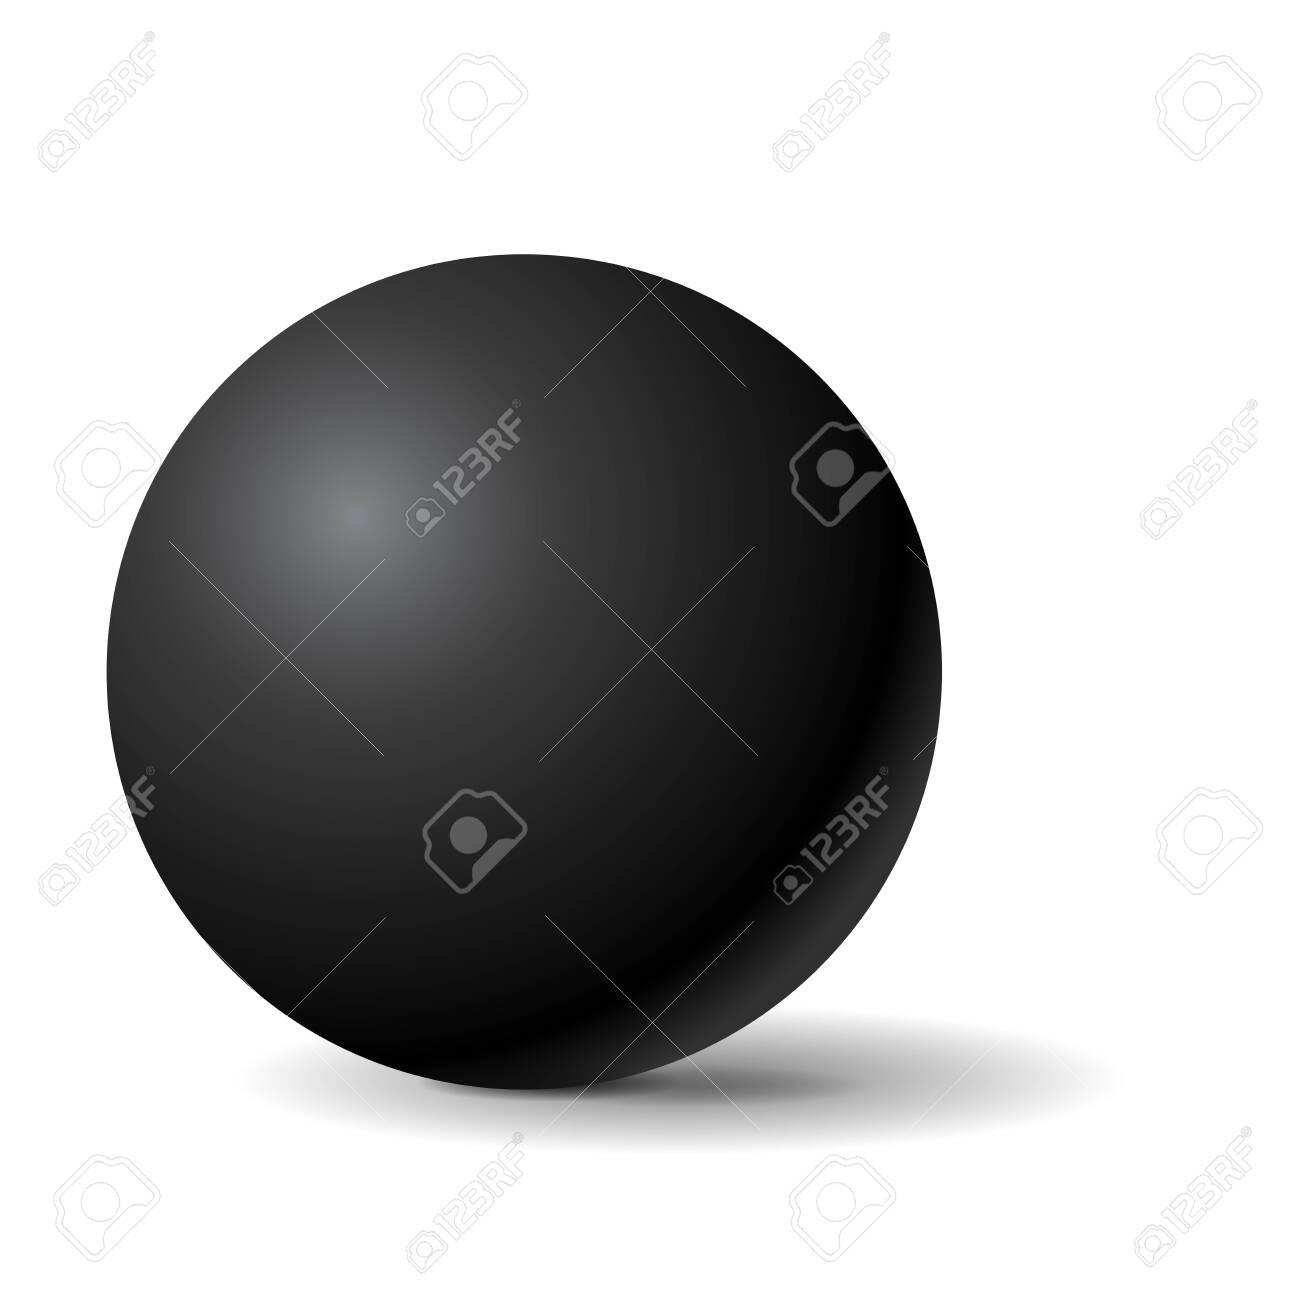 Black sphere. 3d geometric shape. Vector illustration isolated on white background - 141047749